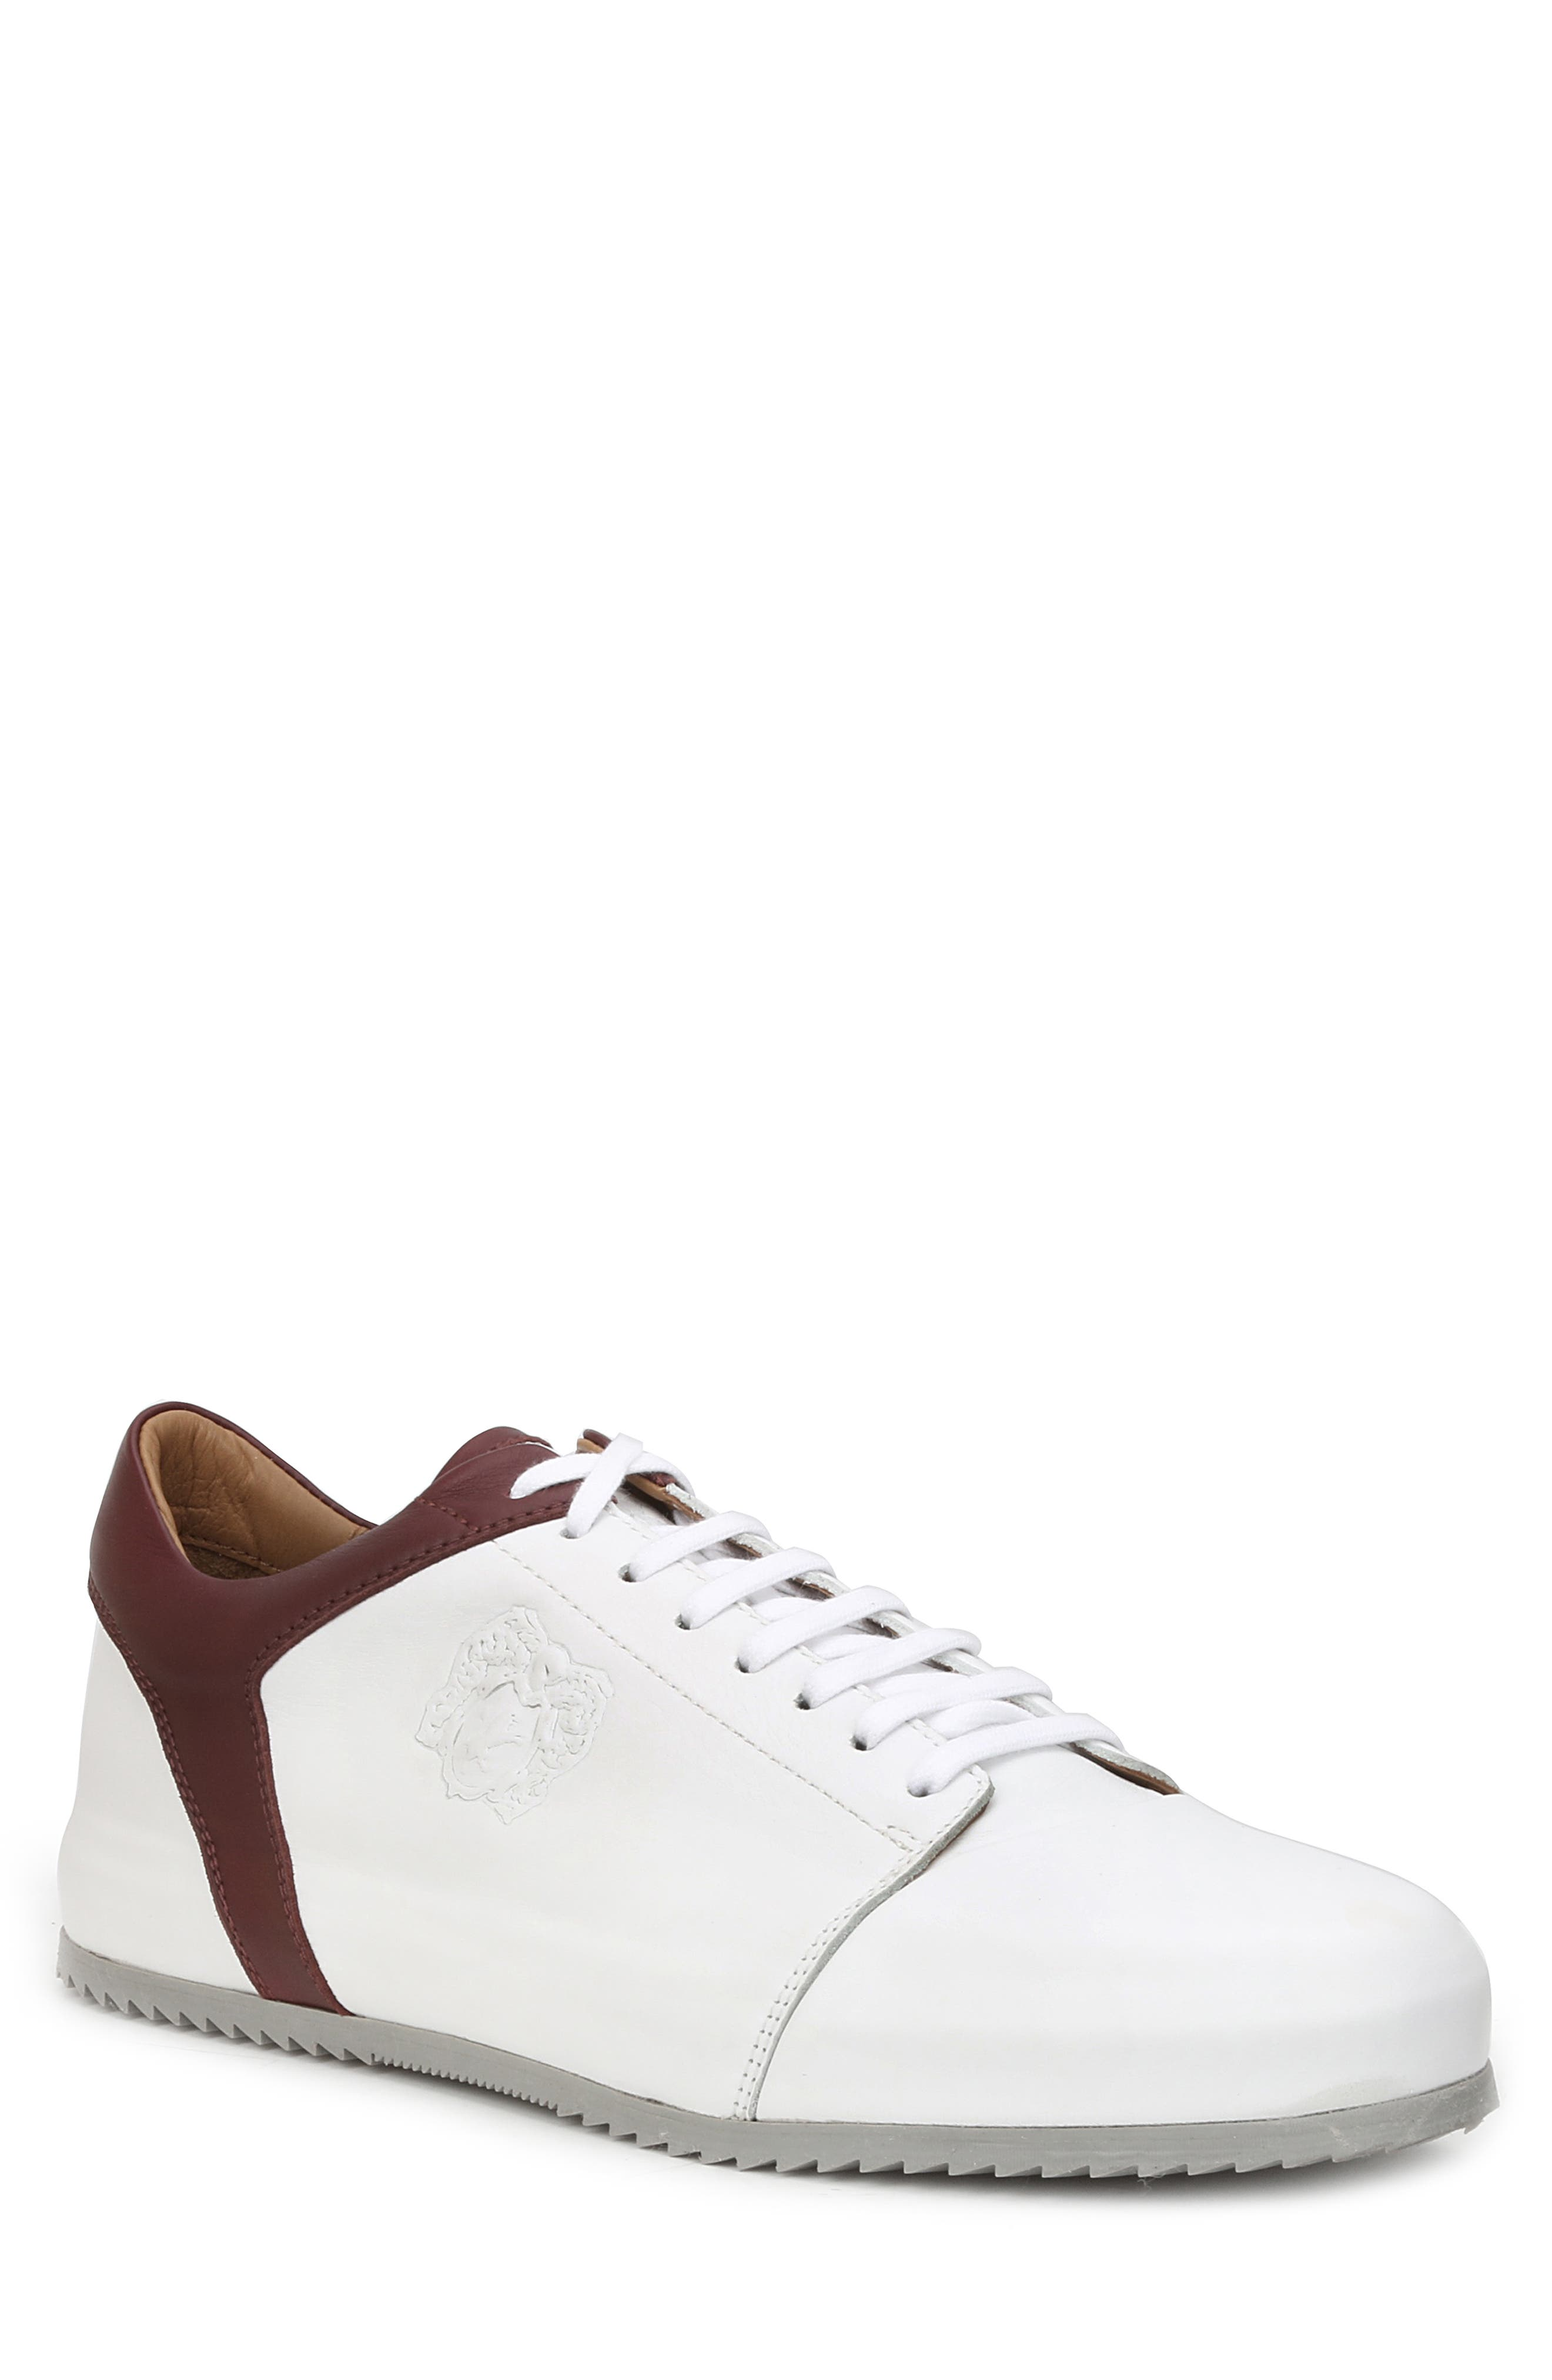 Santana Sneaker,                         Main,                         color, WHITE/ BORDEAUX